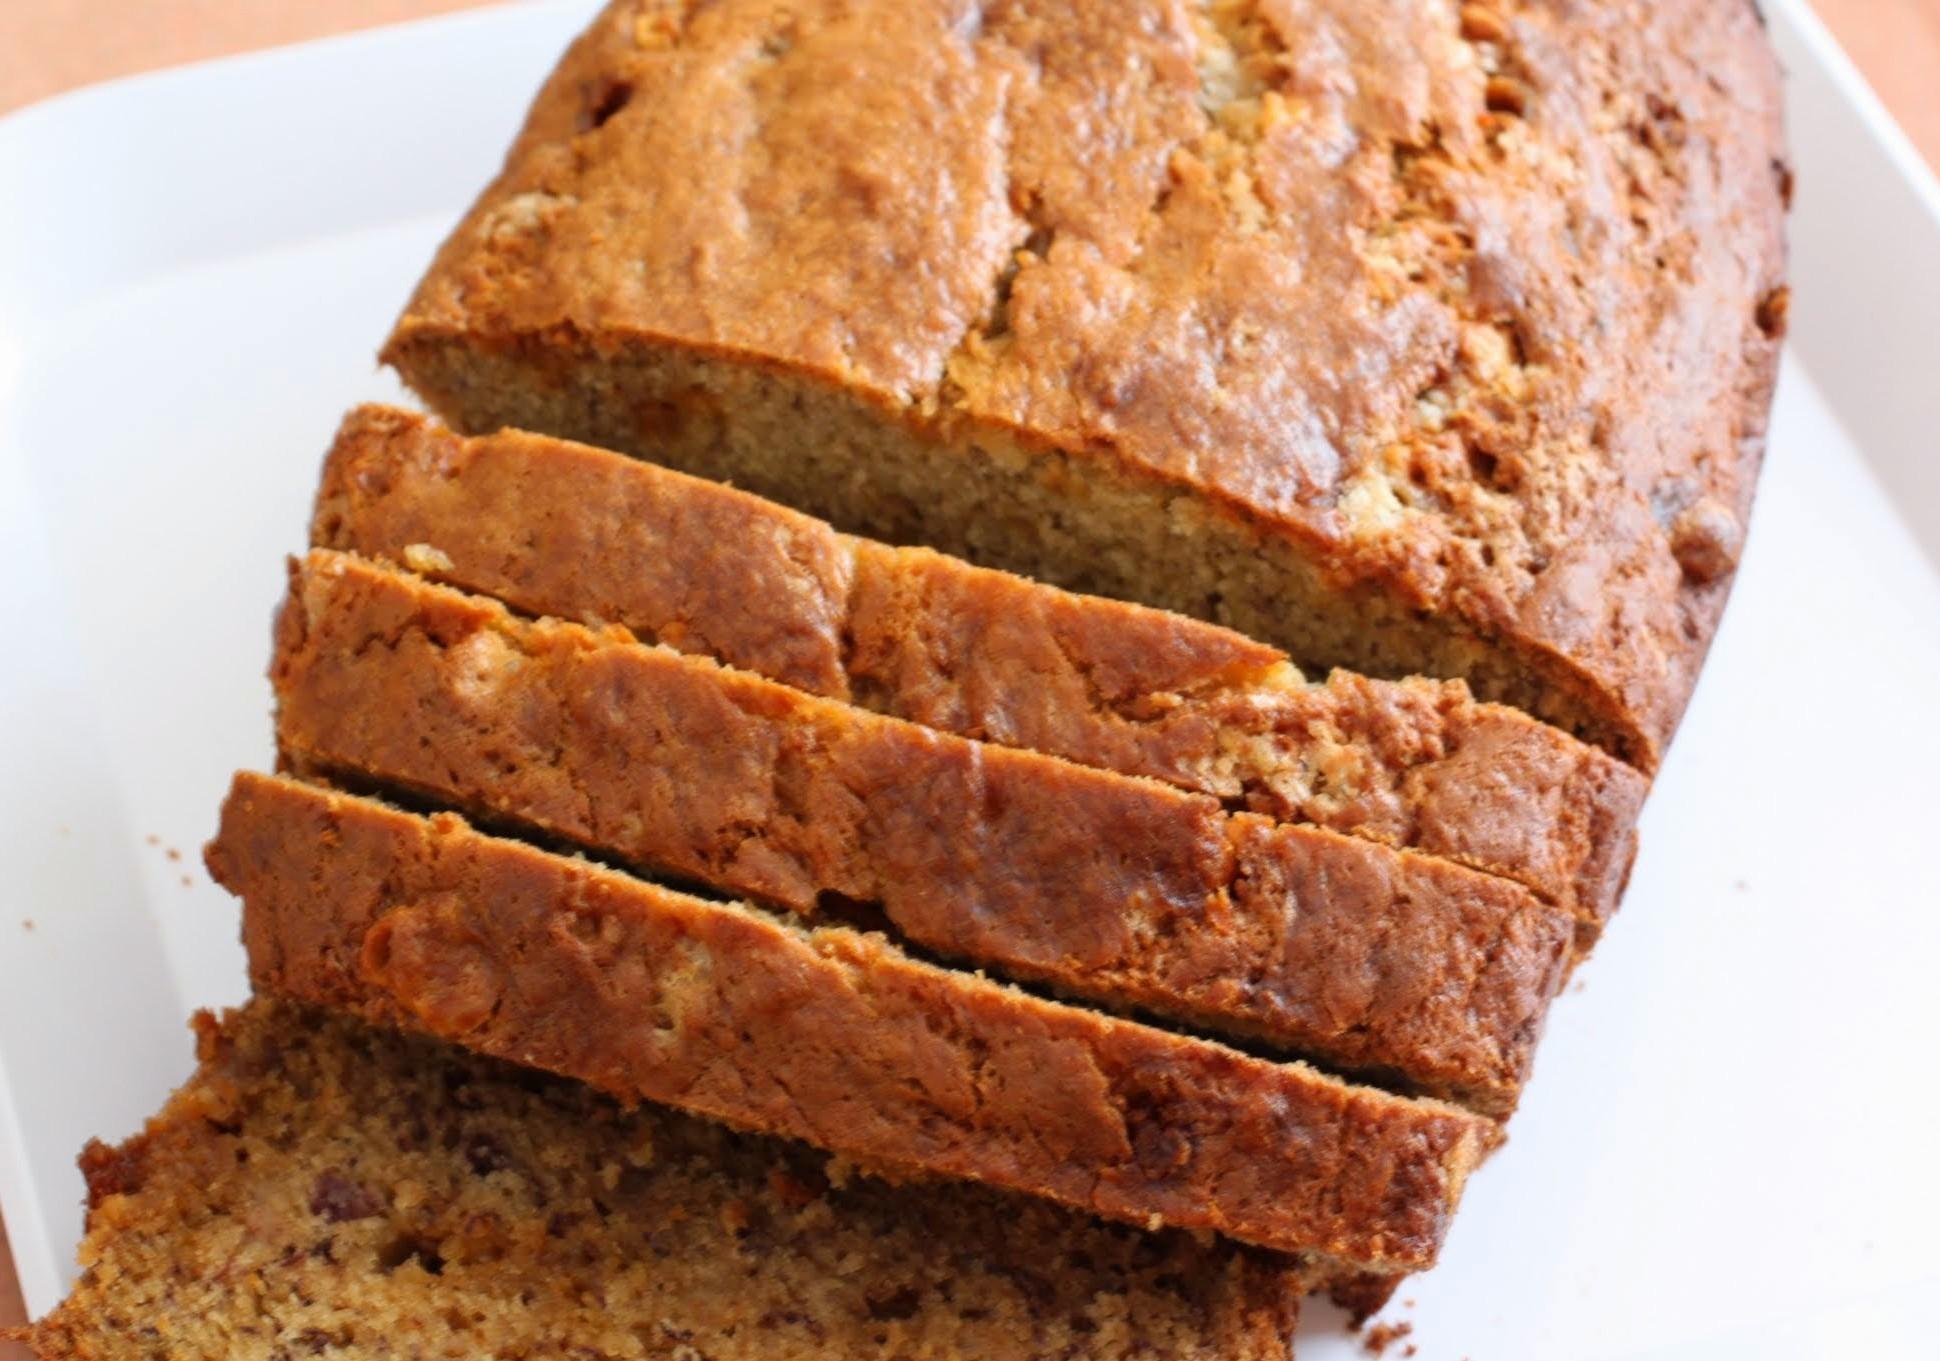 White Chocoolate Butterscotch Banana Bread